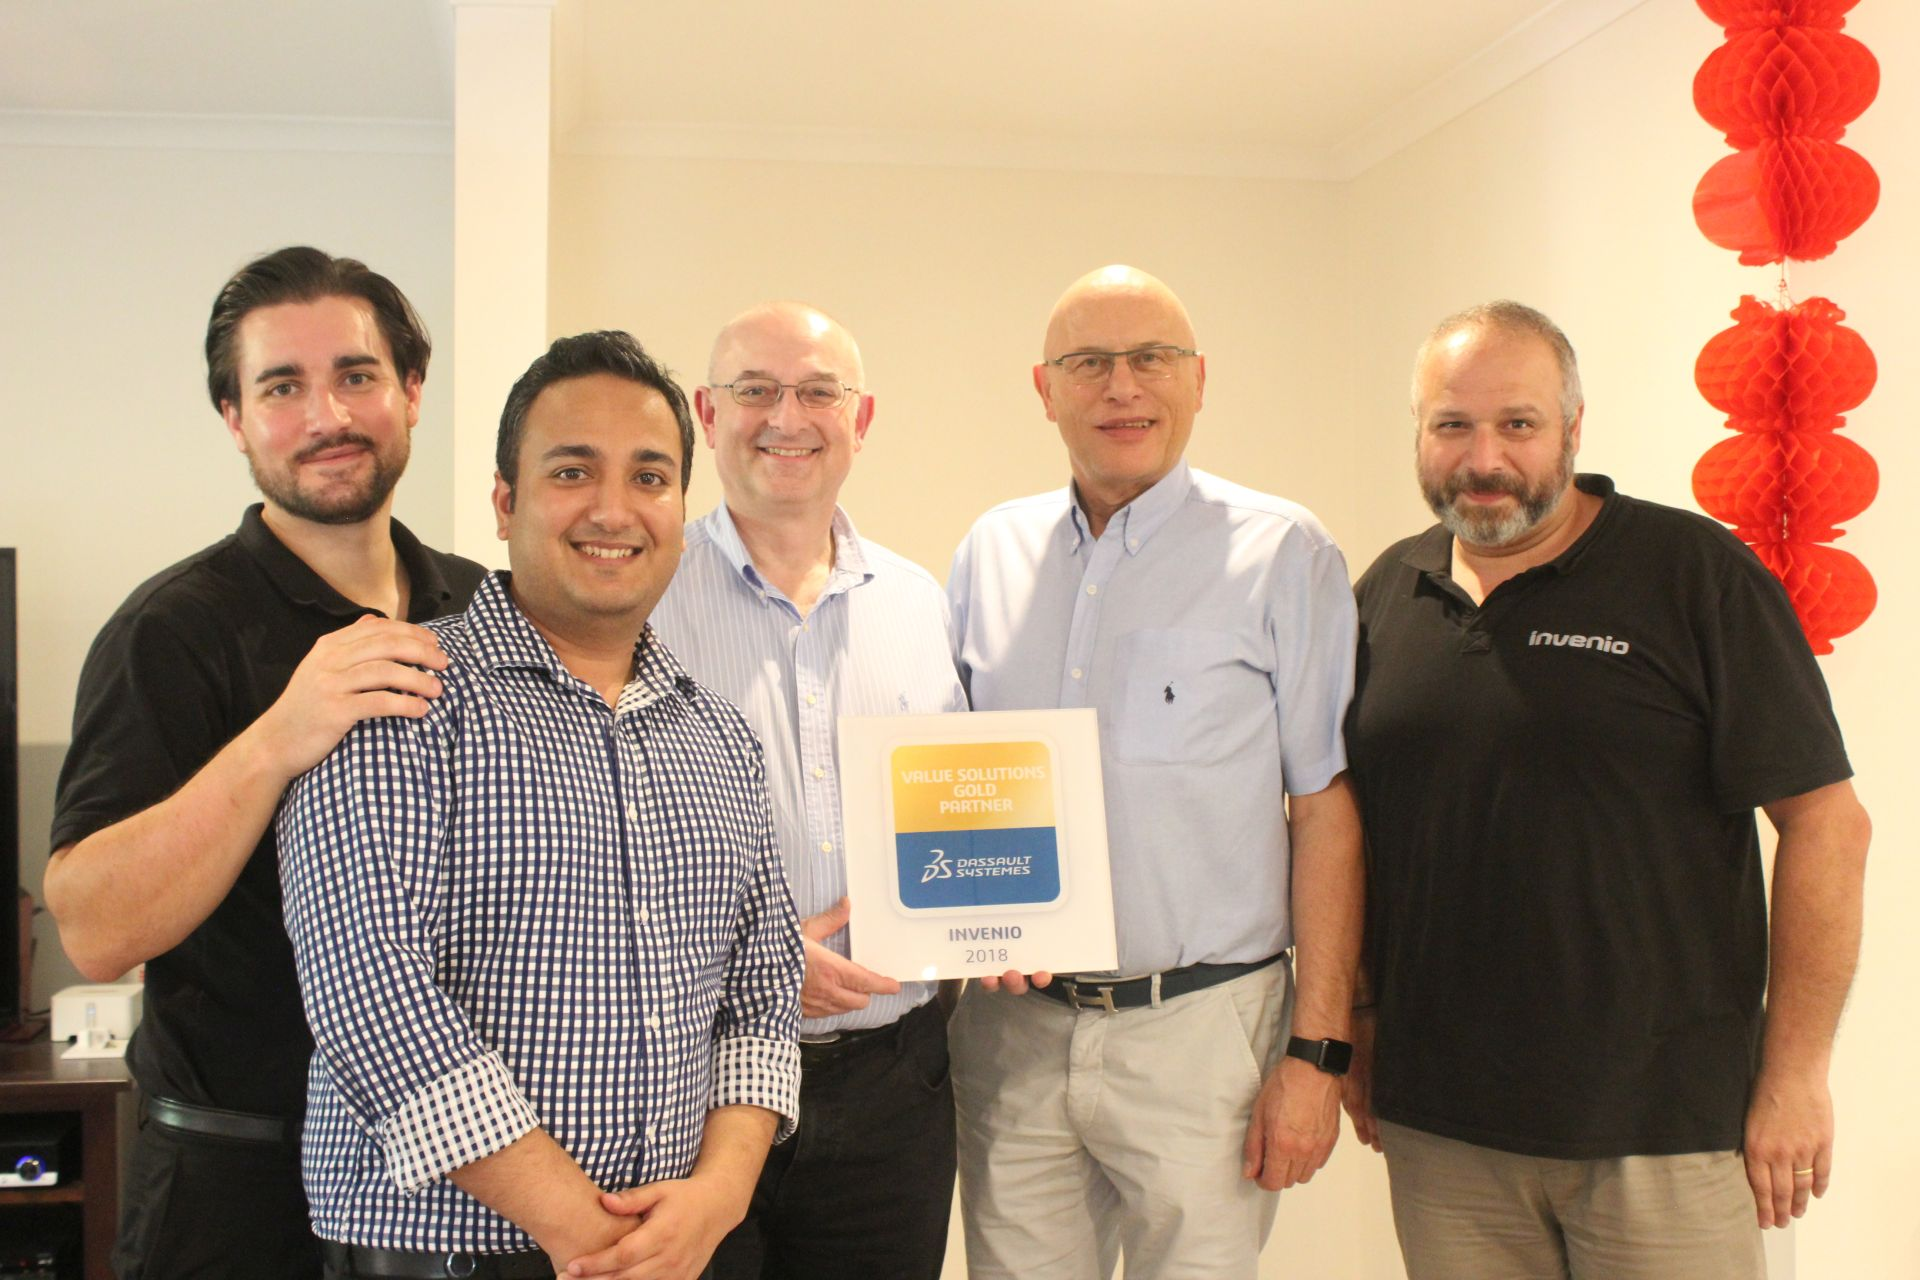 Invenio Awarded Dassault Systèmes Gold Partner Status